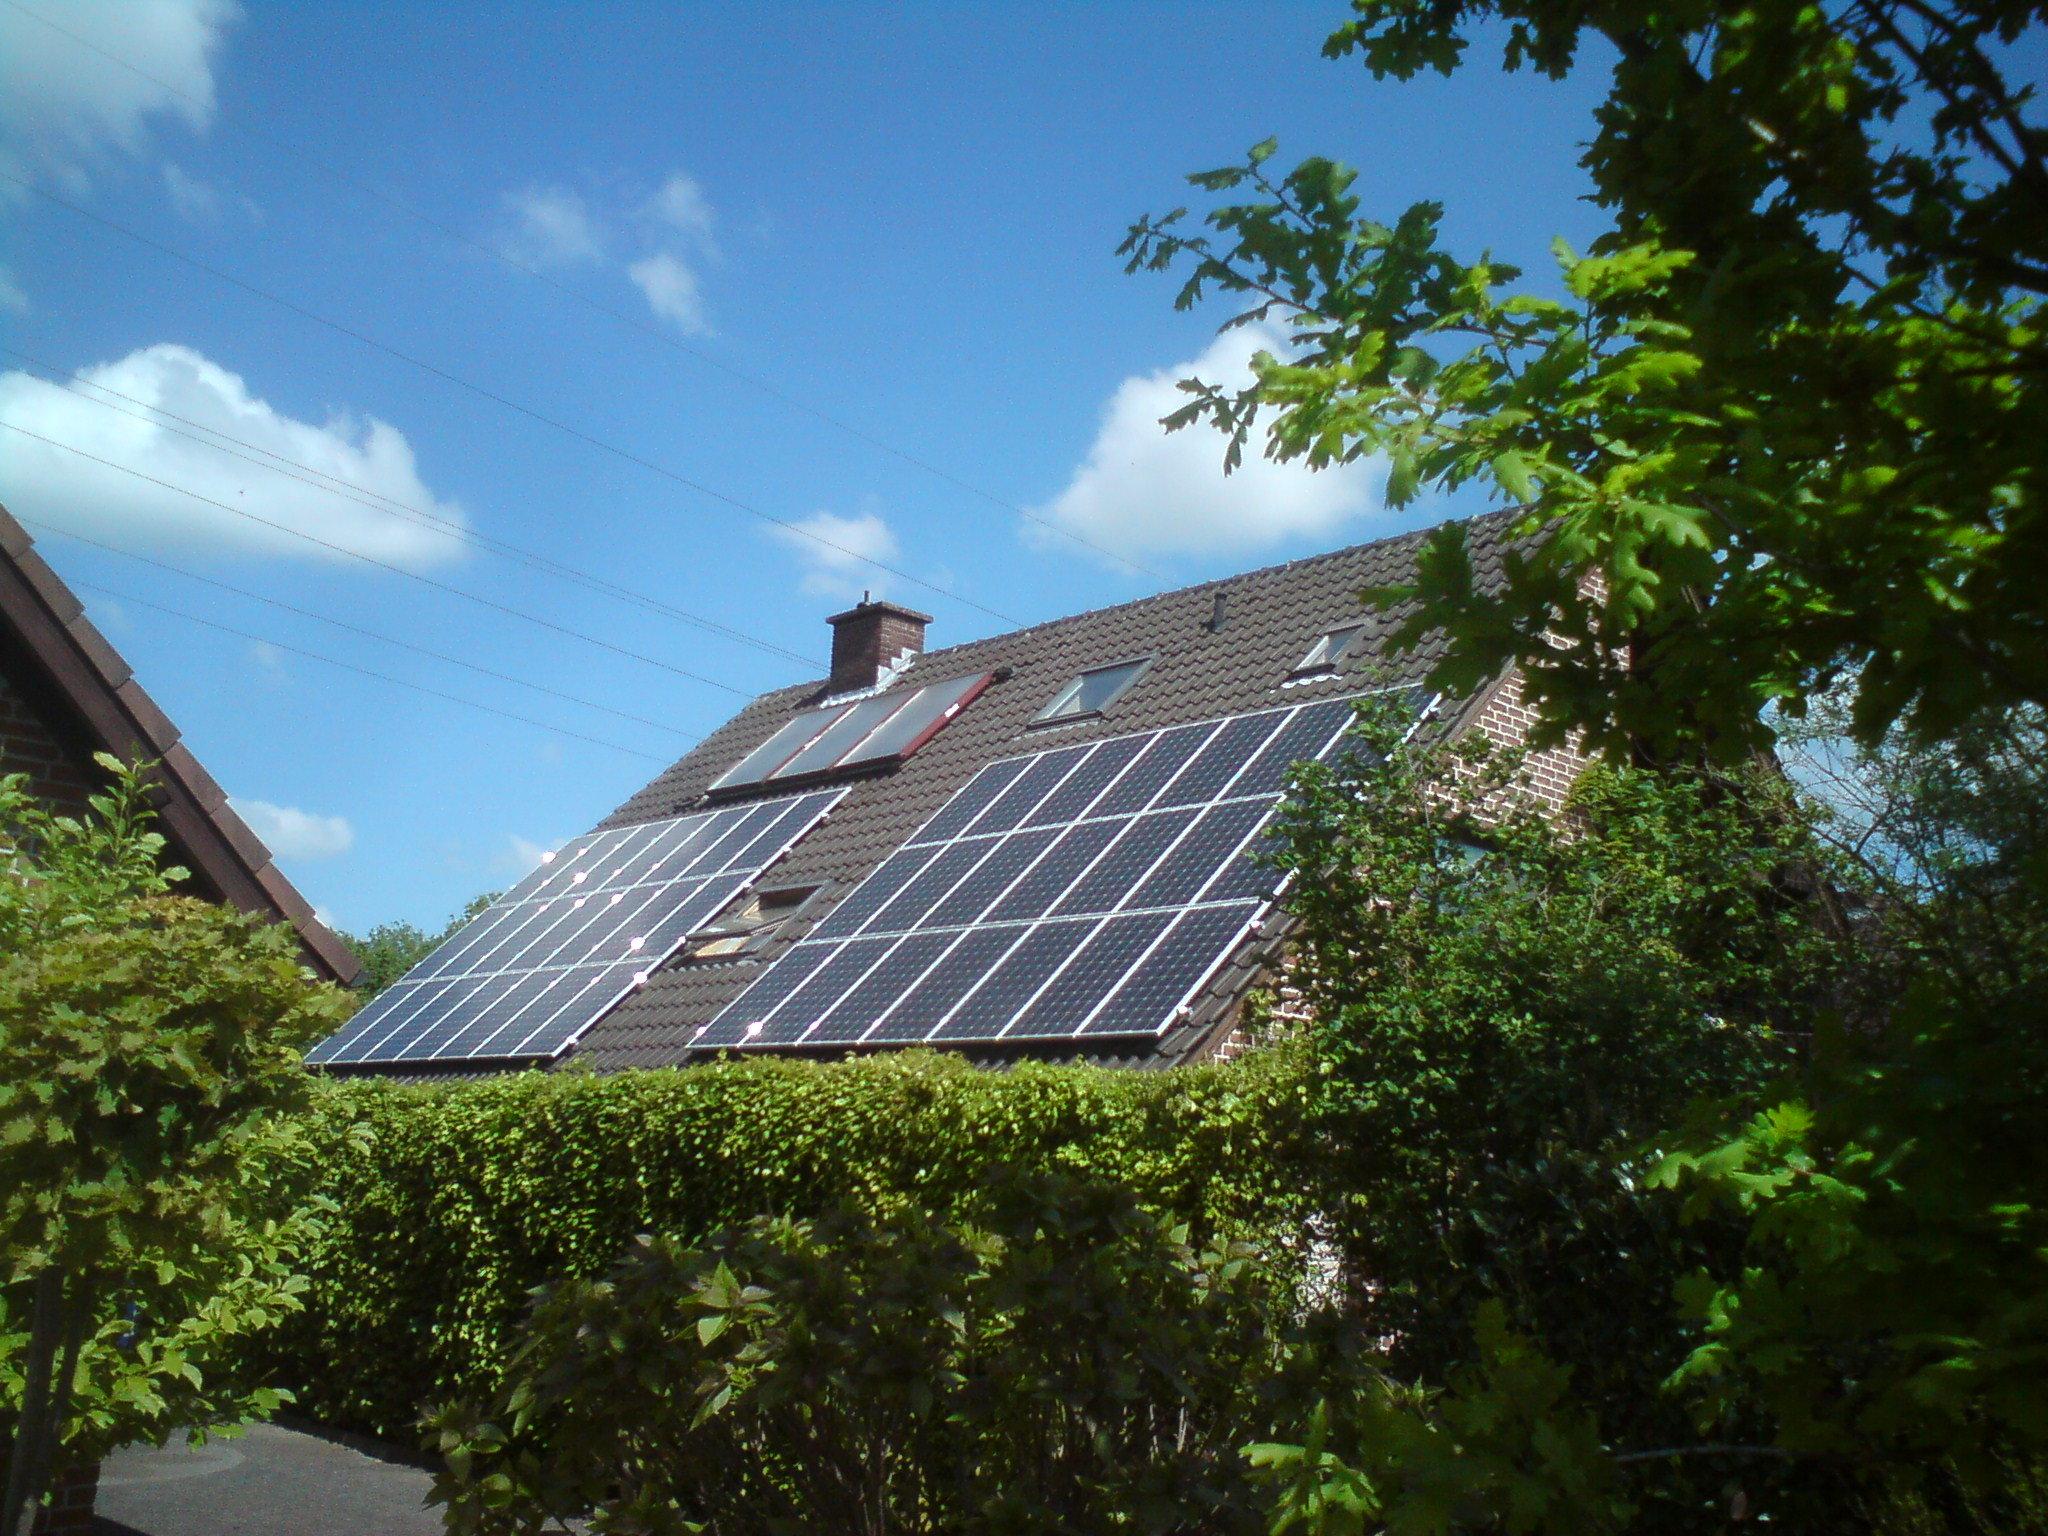 photovoltaik finanzierung solarkredit 2018. Black Bedroom Furniture Sets. Home Design Ideas